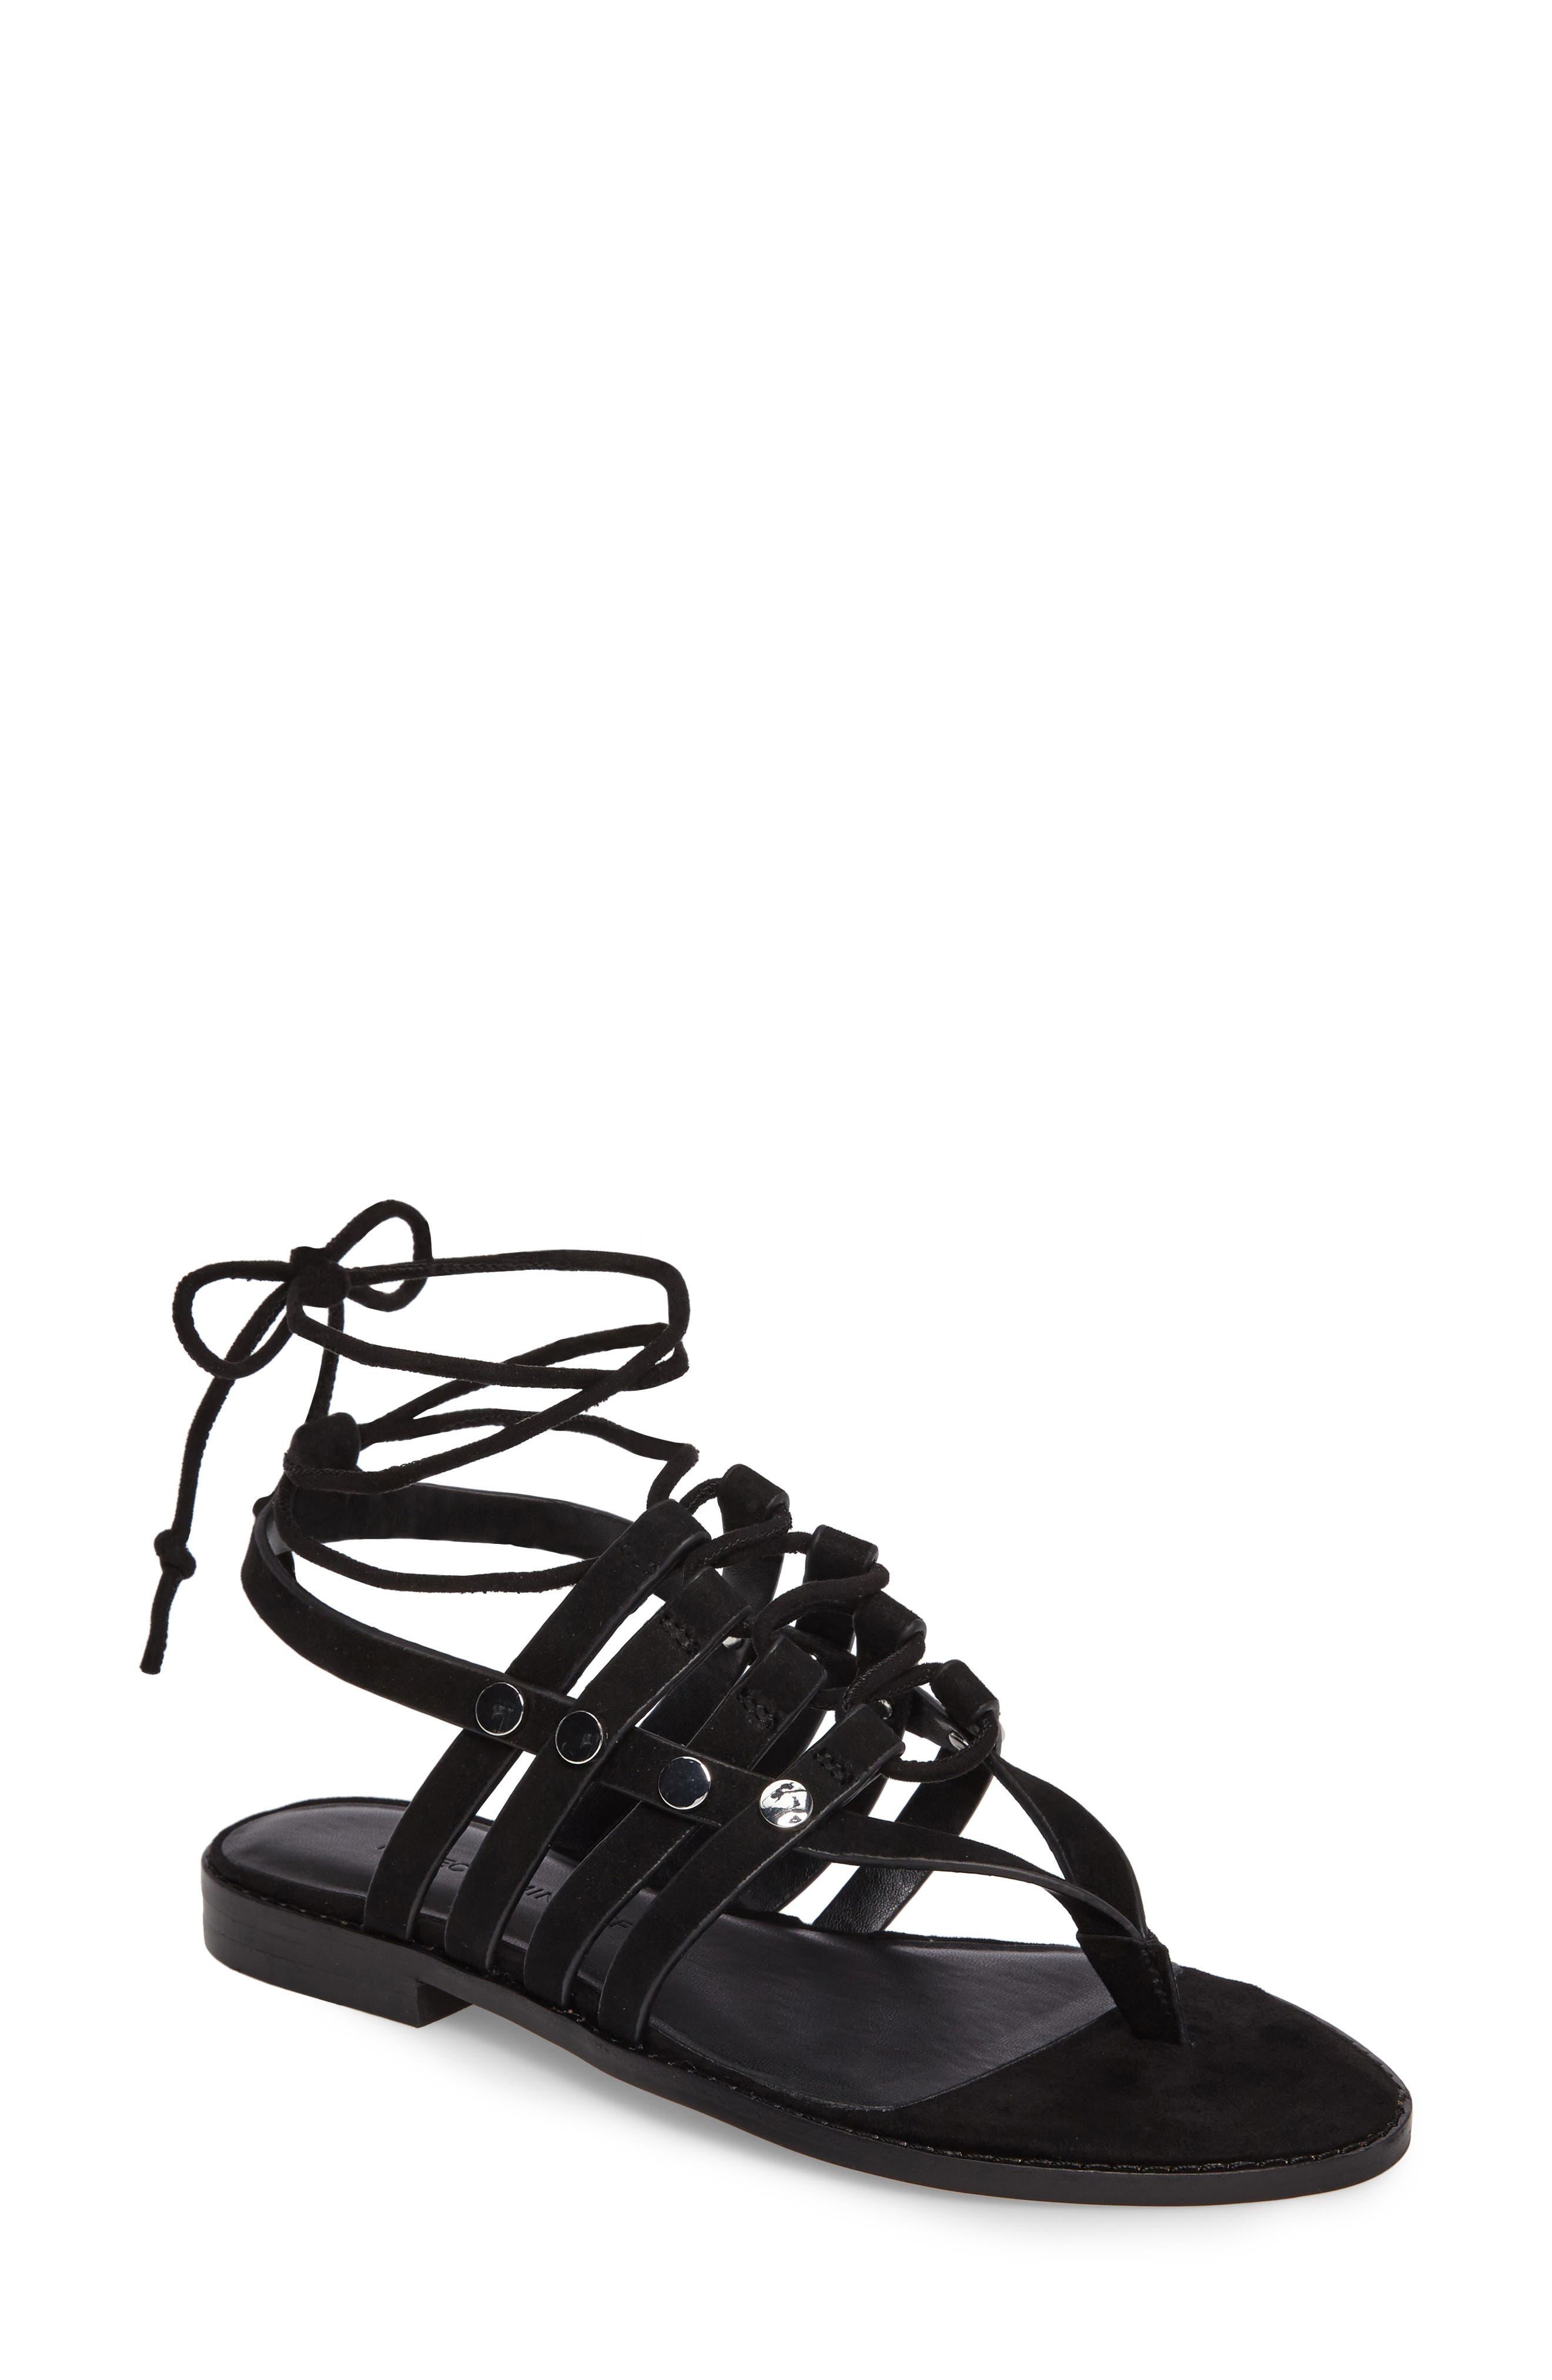 REBECCA MINKOFF Evonne Sandal, Main, color, 004